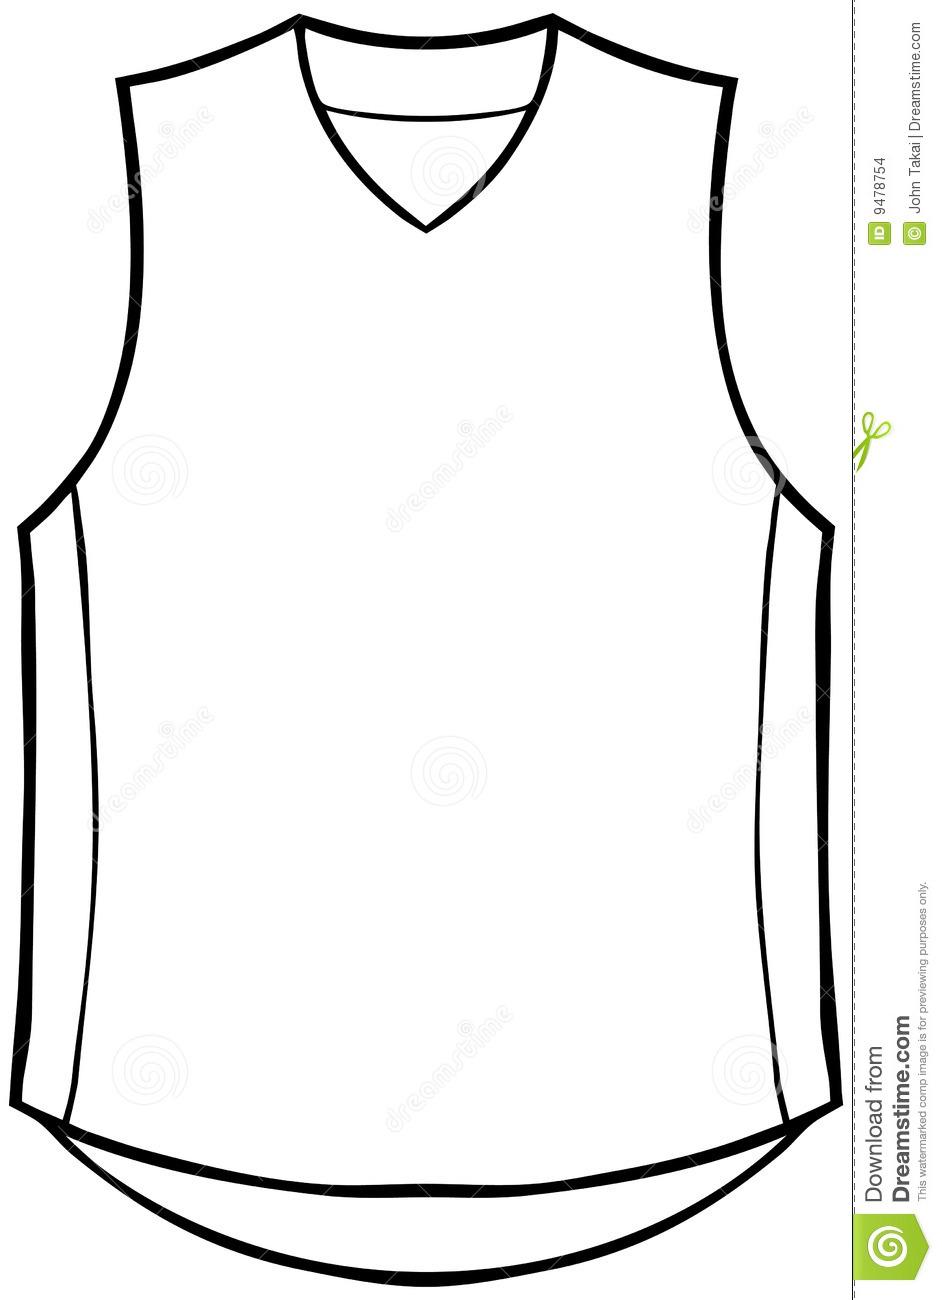 942x1300 Uniform Clipart Basketball Uniform